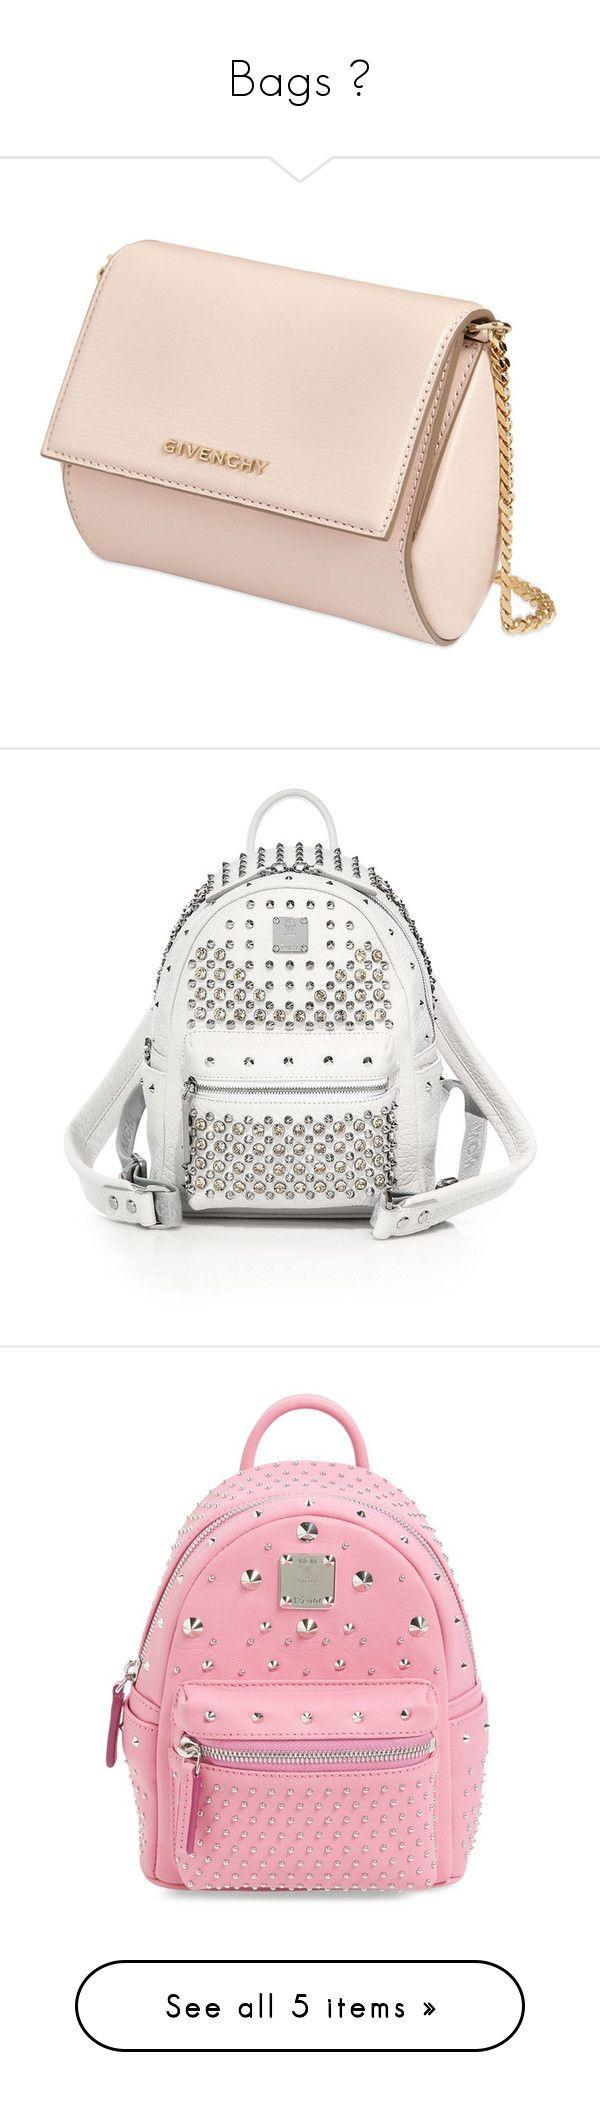 """Bags 👛"" by aleciadowdemll ❤ liked on Polyvore featuring bags, handbags, shoulder bags, purses, pink shoulder bag, nude purses, evening purses, evening hand bags, miu miu shoulder bag and clutches"